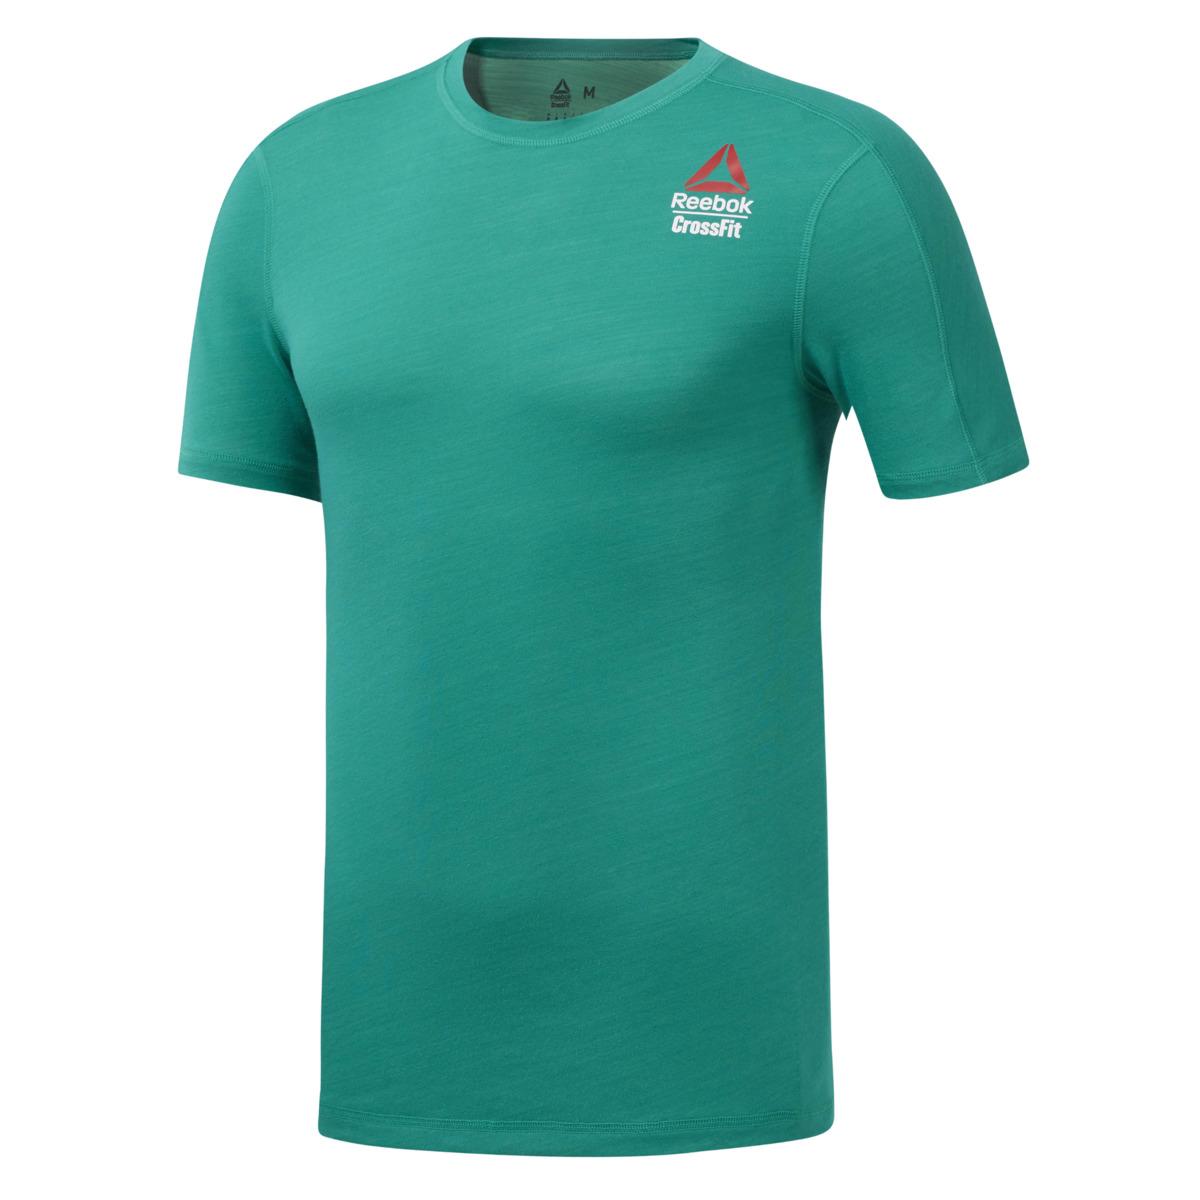 REEBOK Camiseta de hombre Rc Activchill Reebok